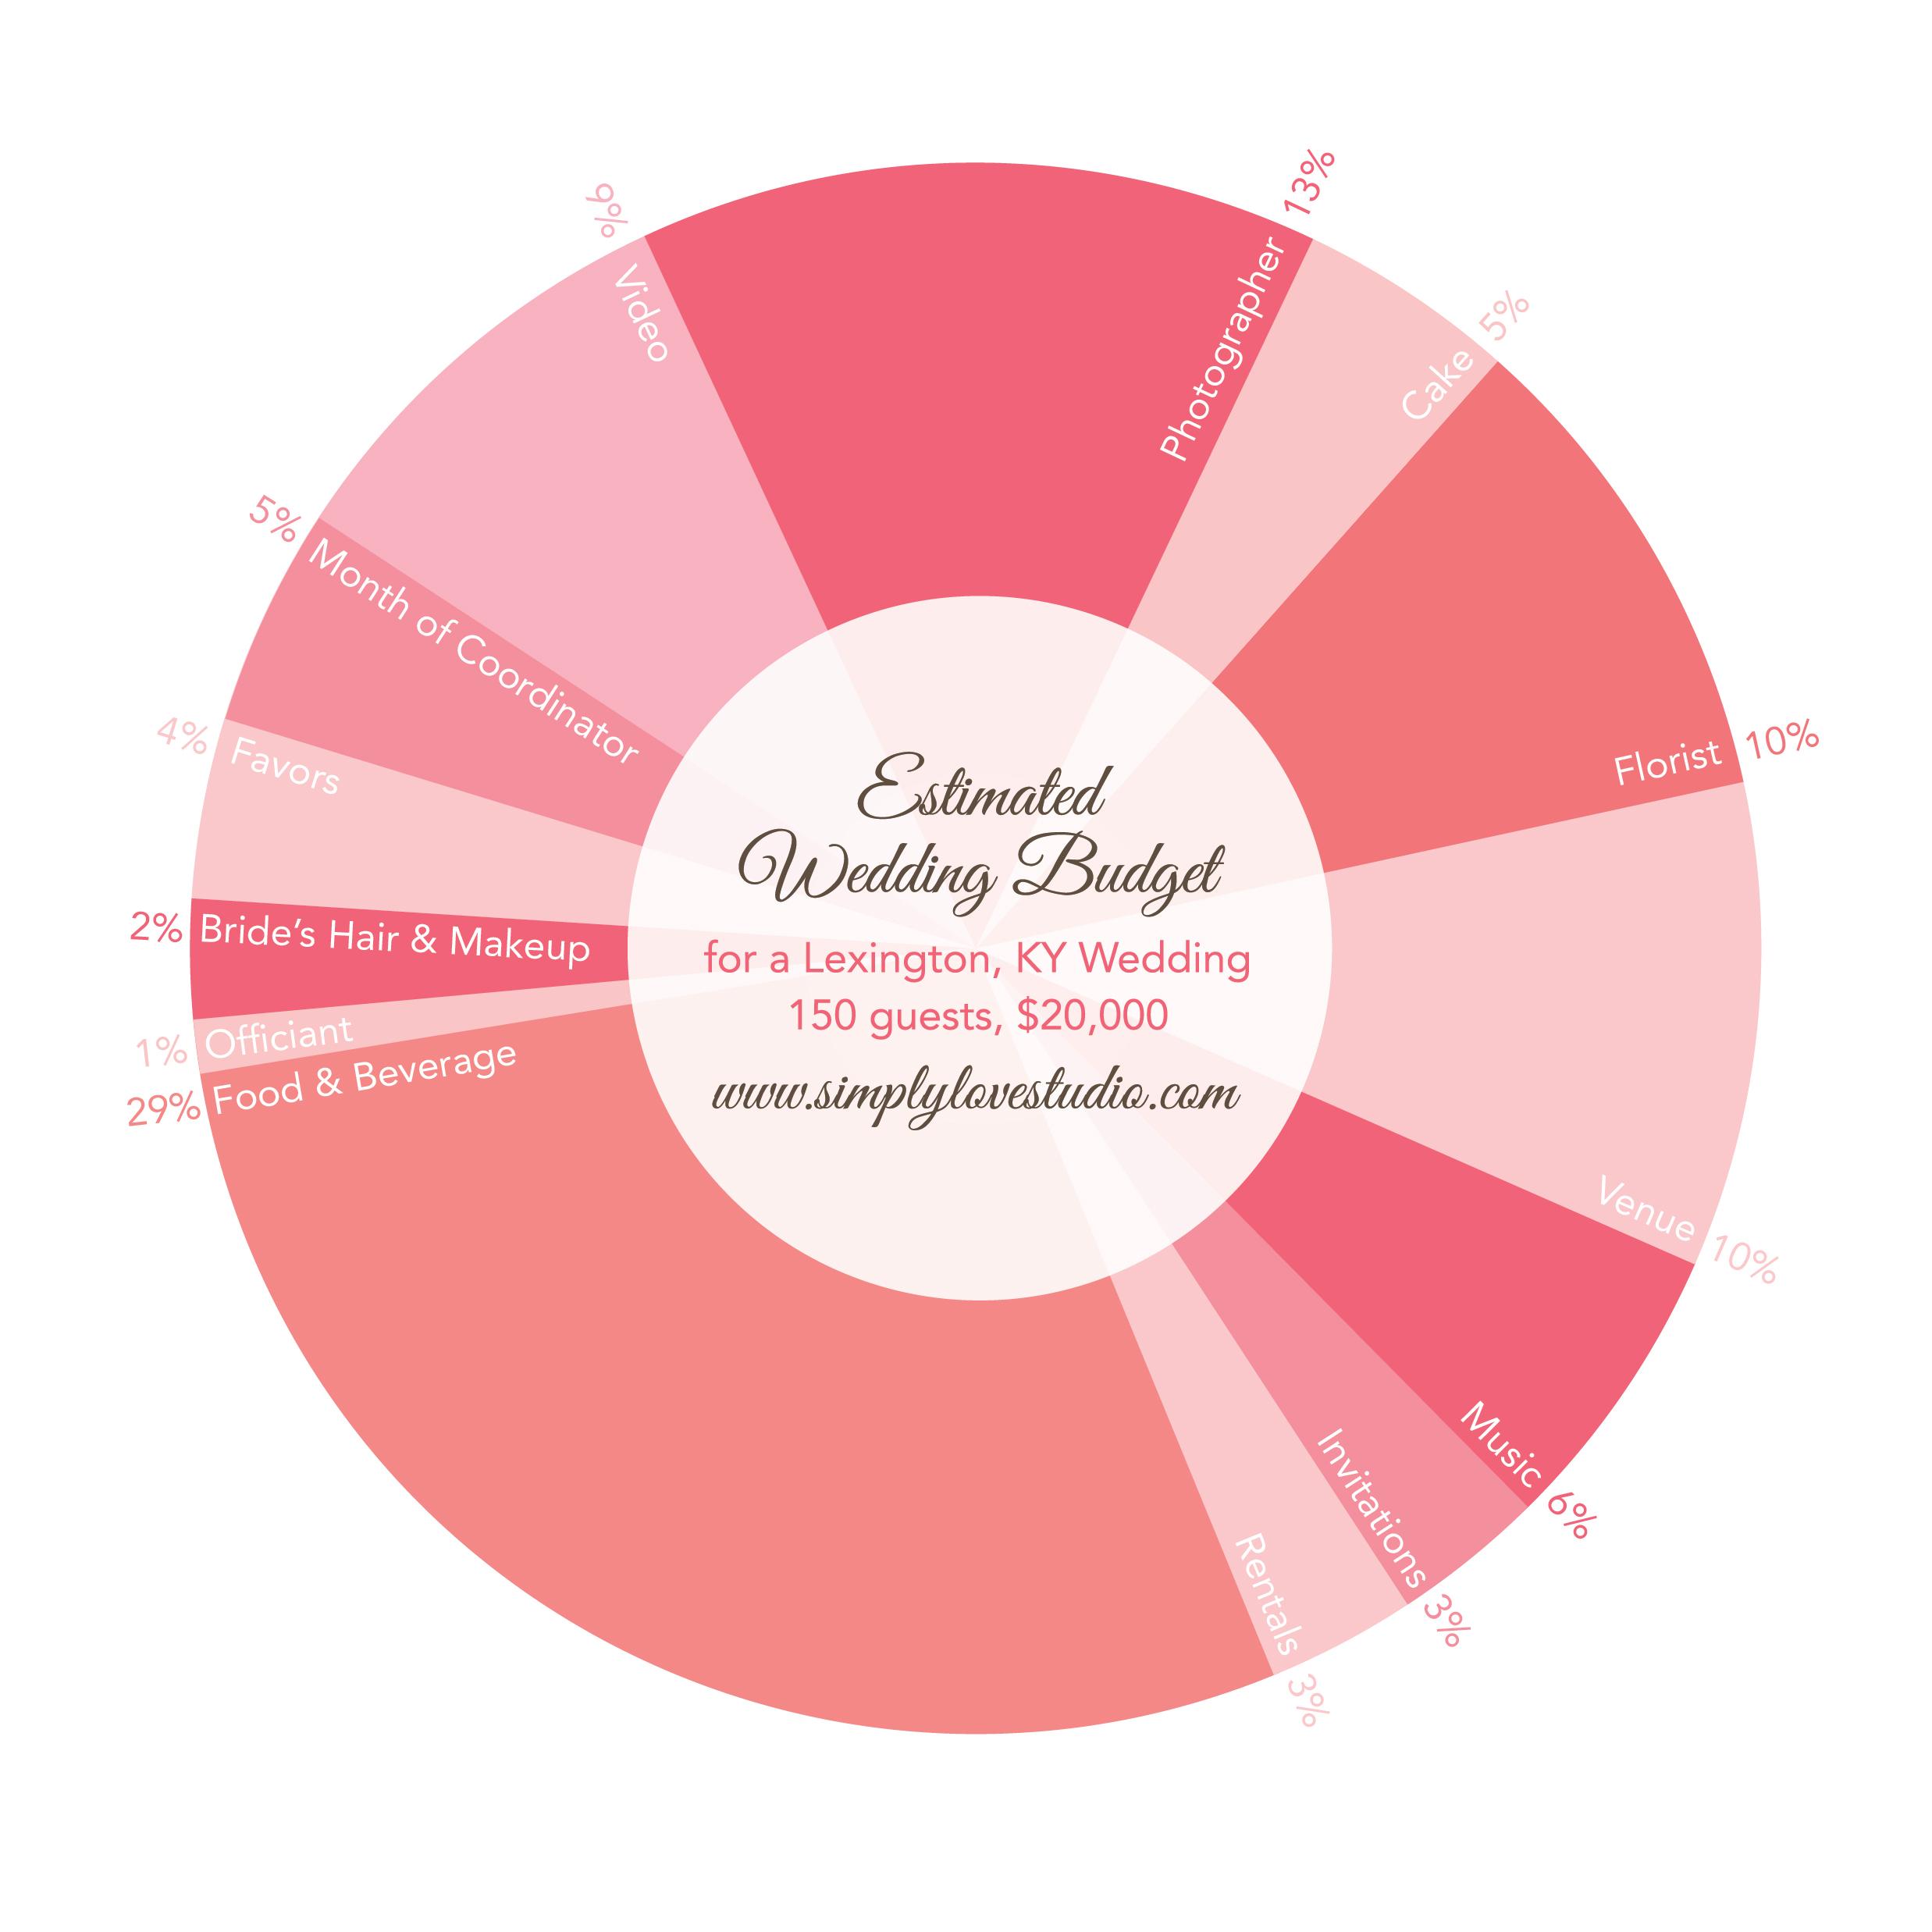 Average Wedding Cost In Lexington Ky